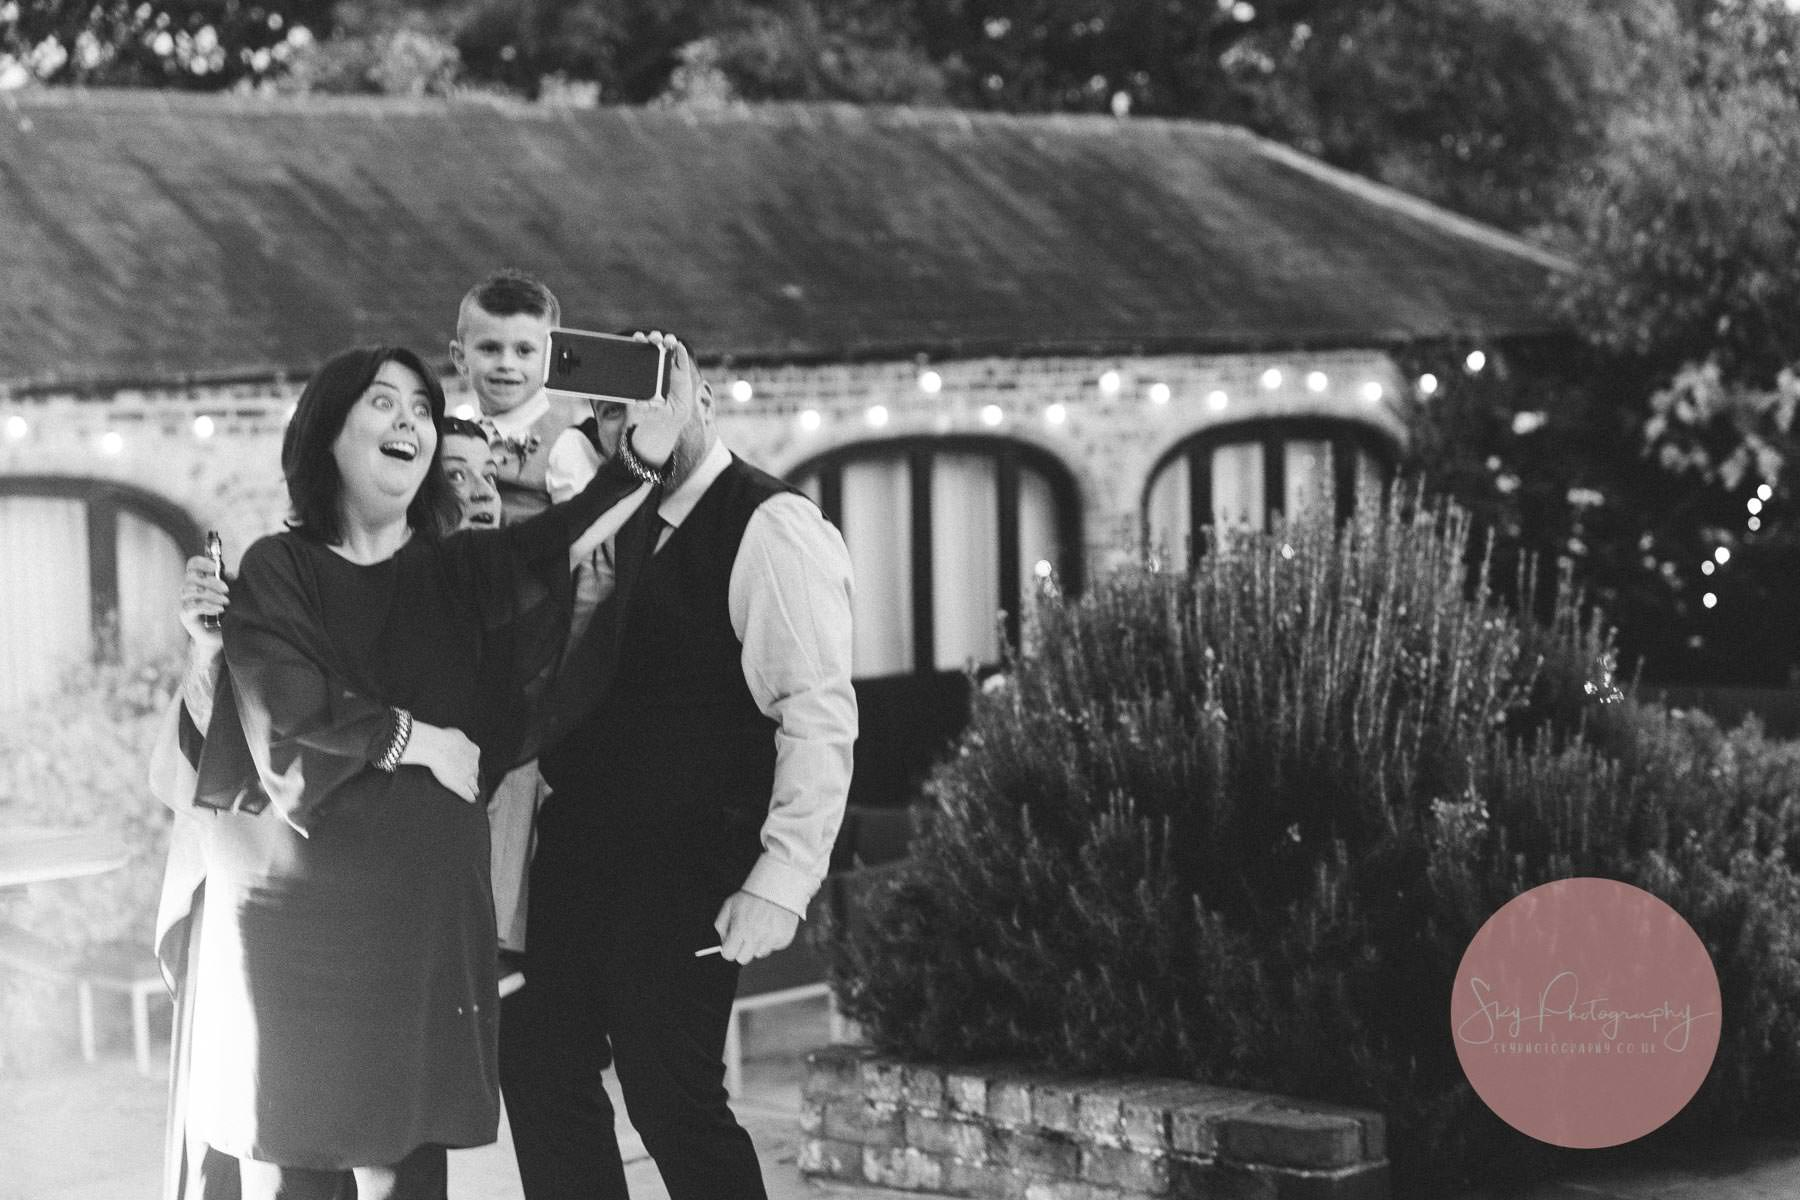 Wedding guests selfie fun